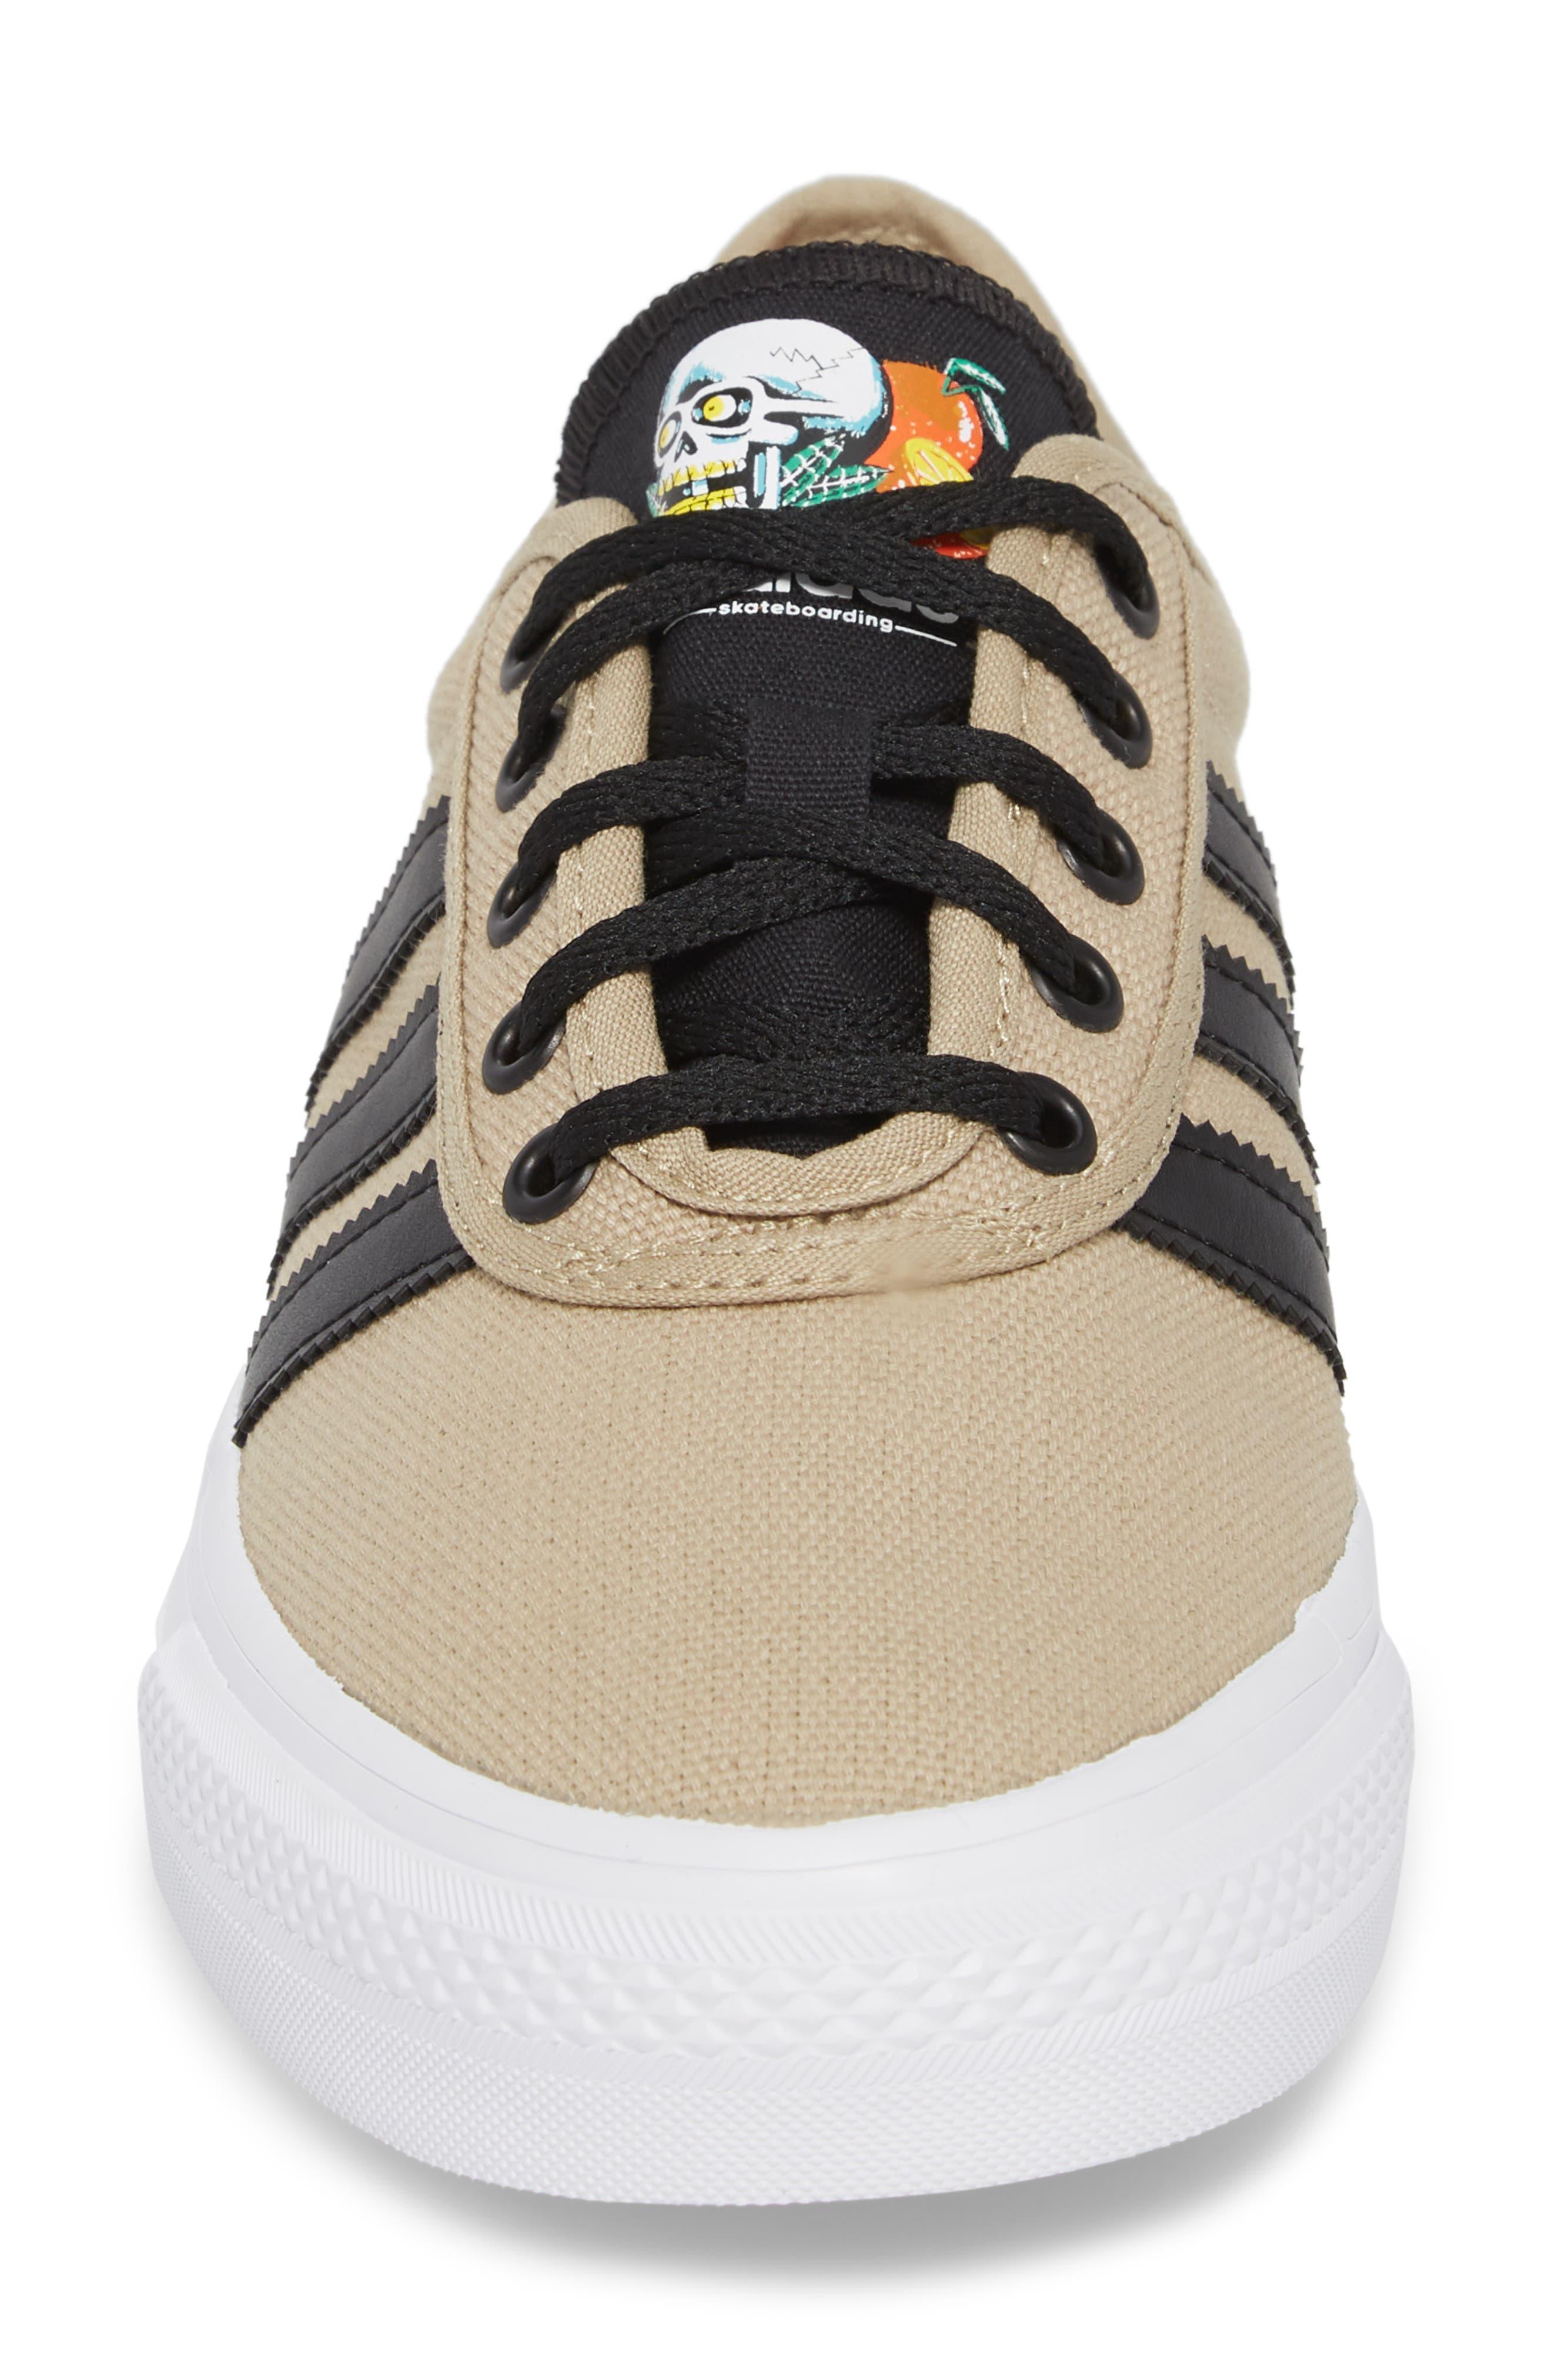 Adiease Premiere Skateboarding Sneaker,                             Alternate thumbnail 4, color,                             GOLD/ CORE BLACK/ WHITE